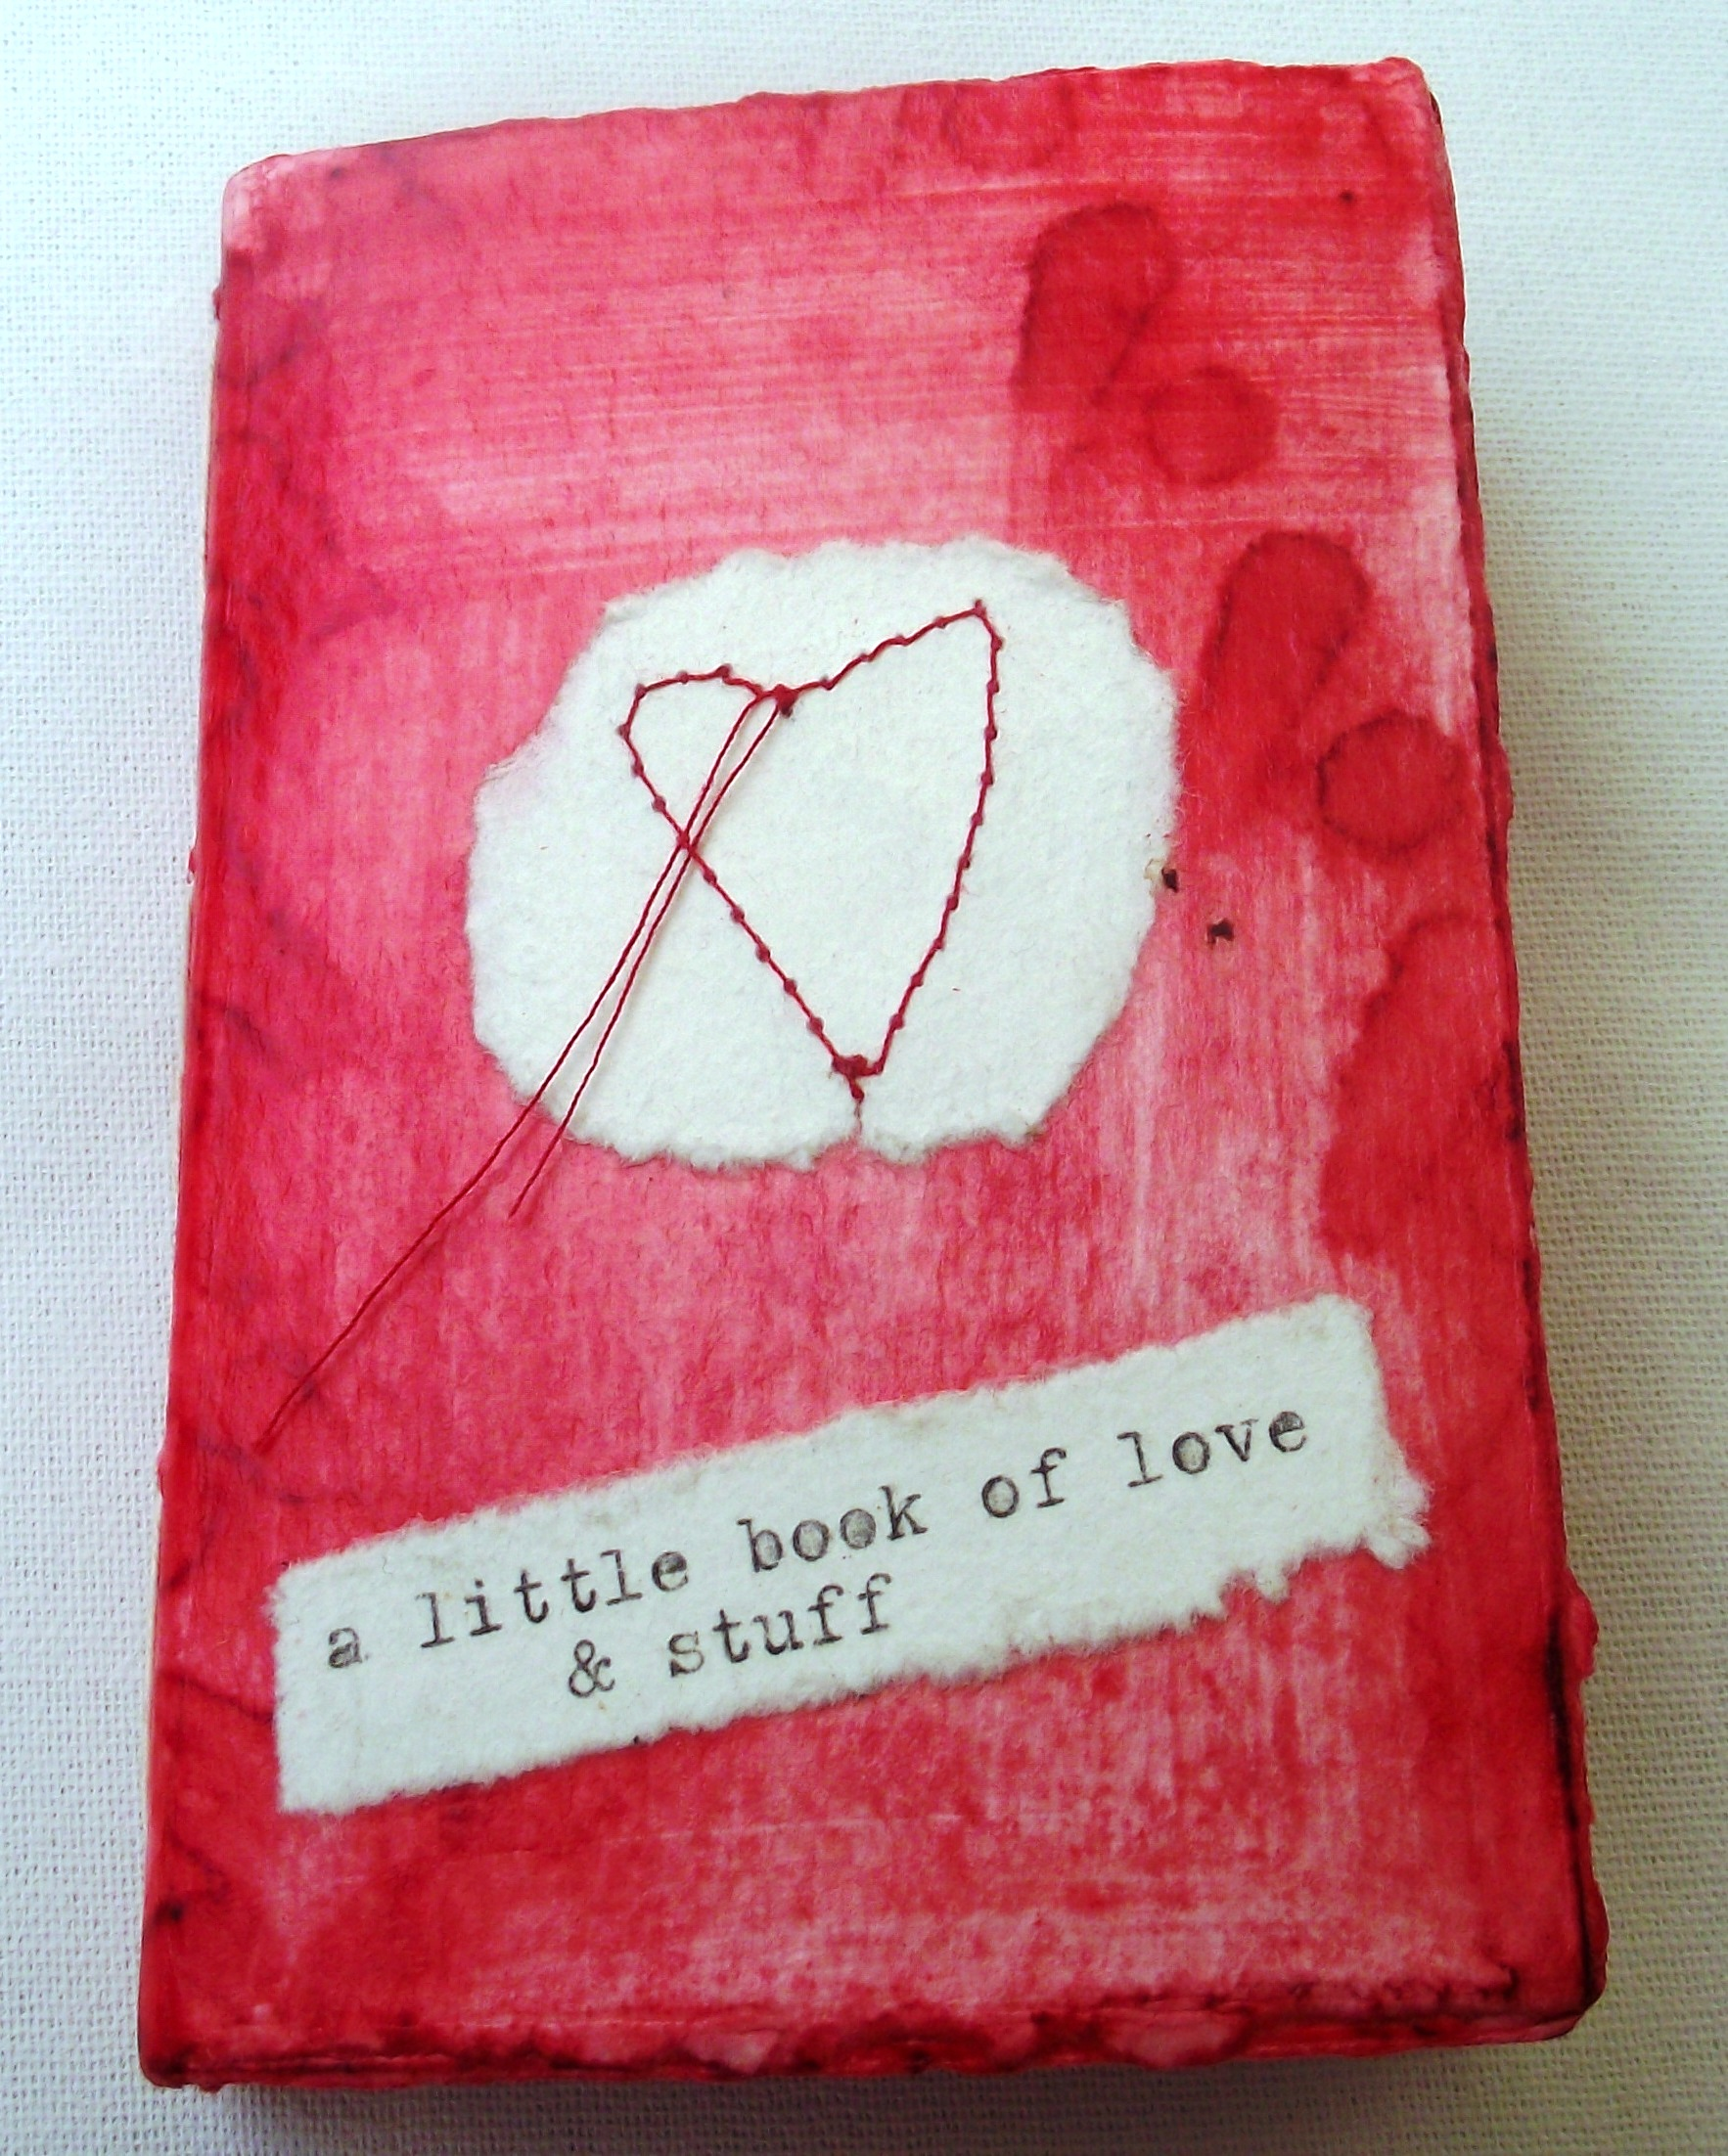 Book Art Studios - love & stuff